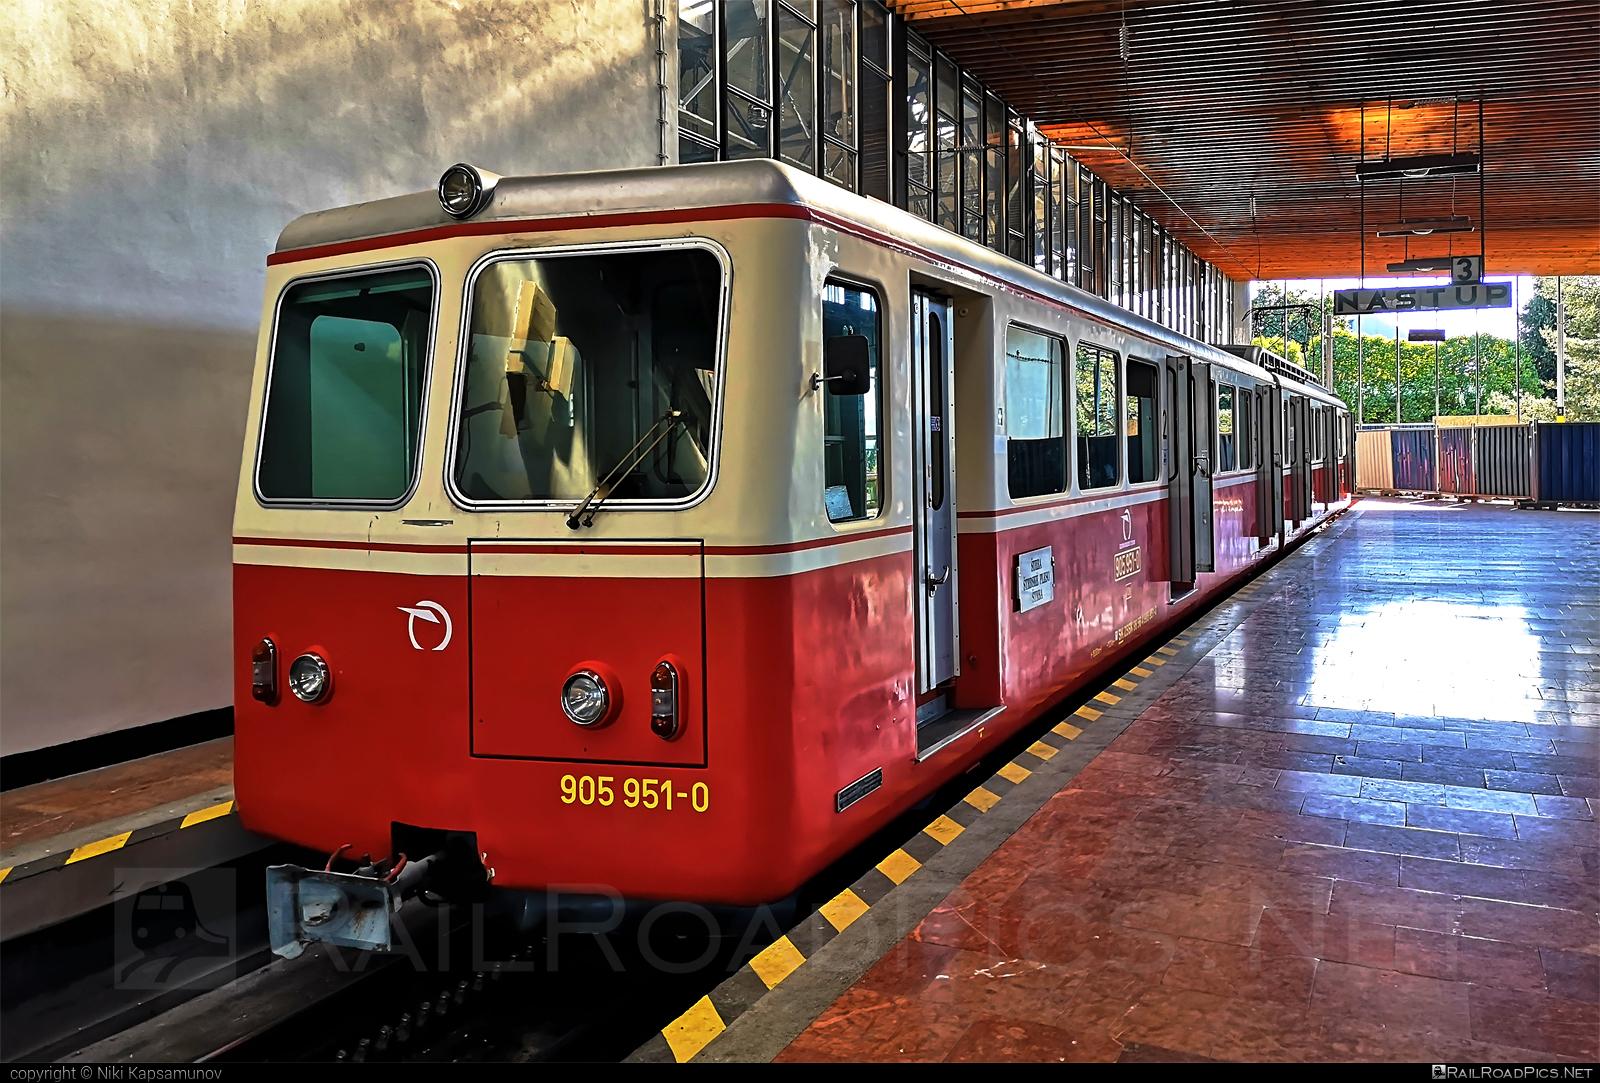 SLM Class 905.95 - 905 951-0 operated by Železničná Spoločnost' Slovensko, a.s. #ZeleznicnaSpolocnostSlovensko #brownboveri #cog #cograilway #hightatrascogtrain #ozubnica #ozubnicovazeleznica #schweizerischelokomotivundmaschinenfabrik #slm #slm90595 #swisslocomotiveandmachineworks #zssk #zssk905 #zssk90595 #zubacka